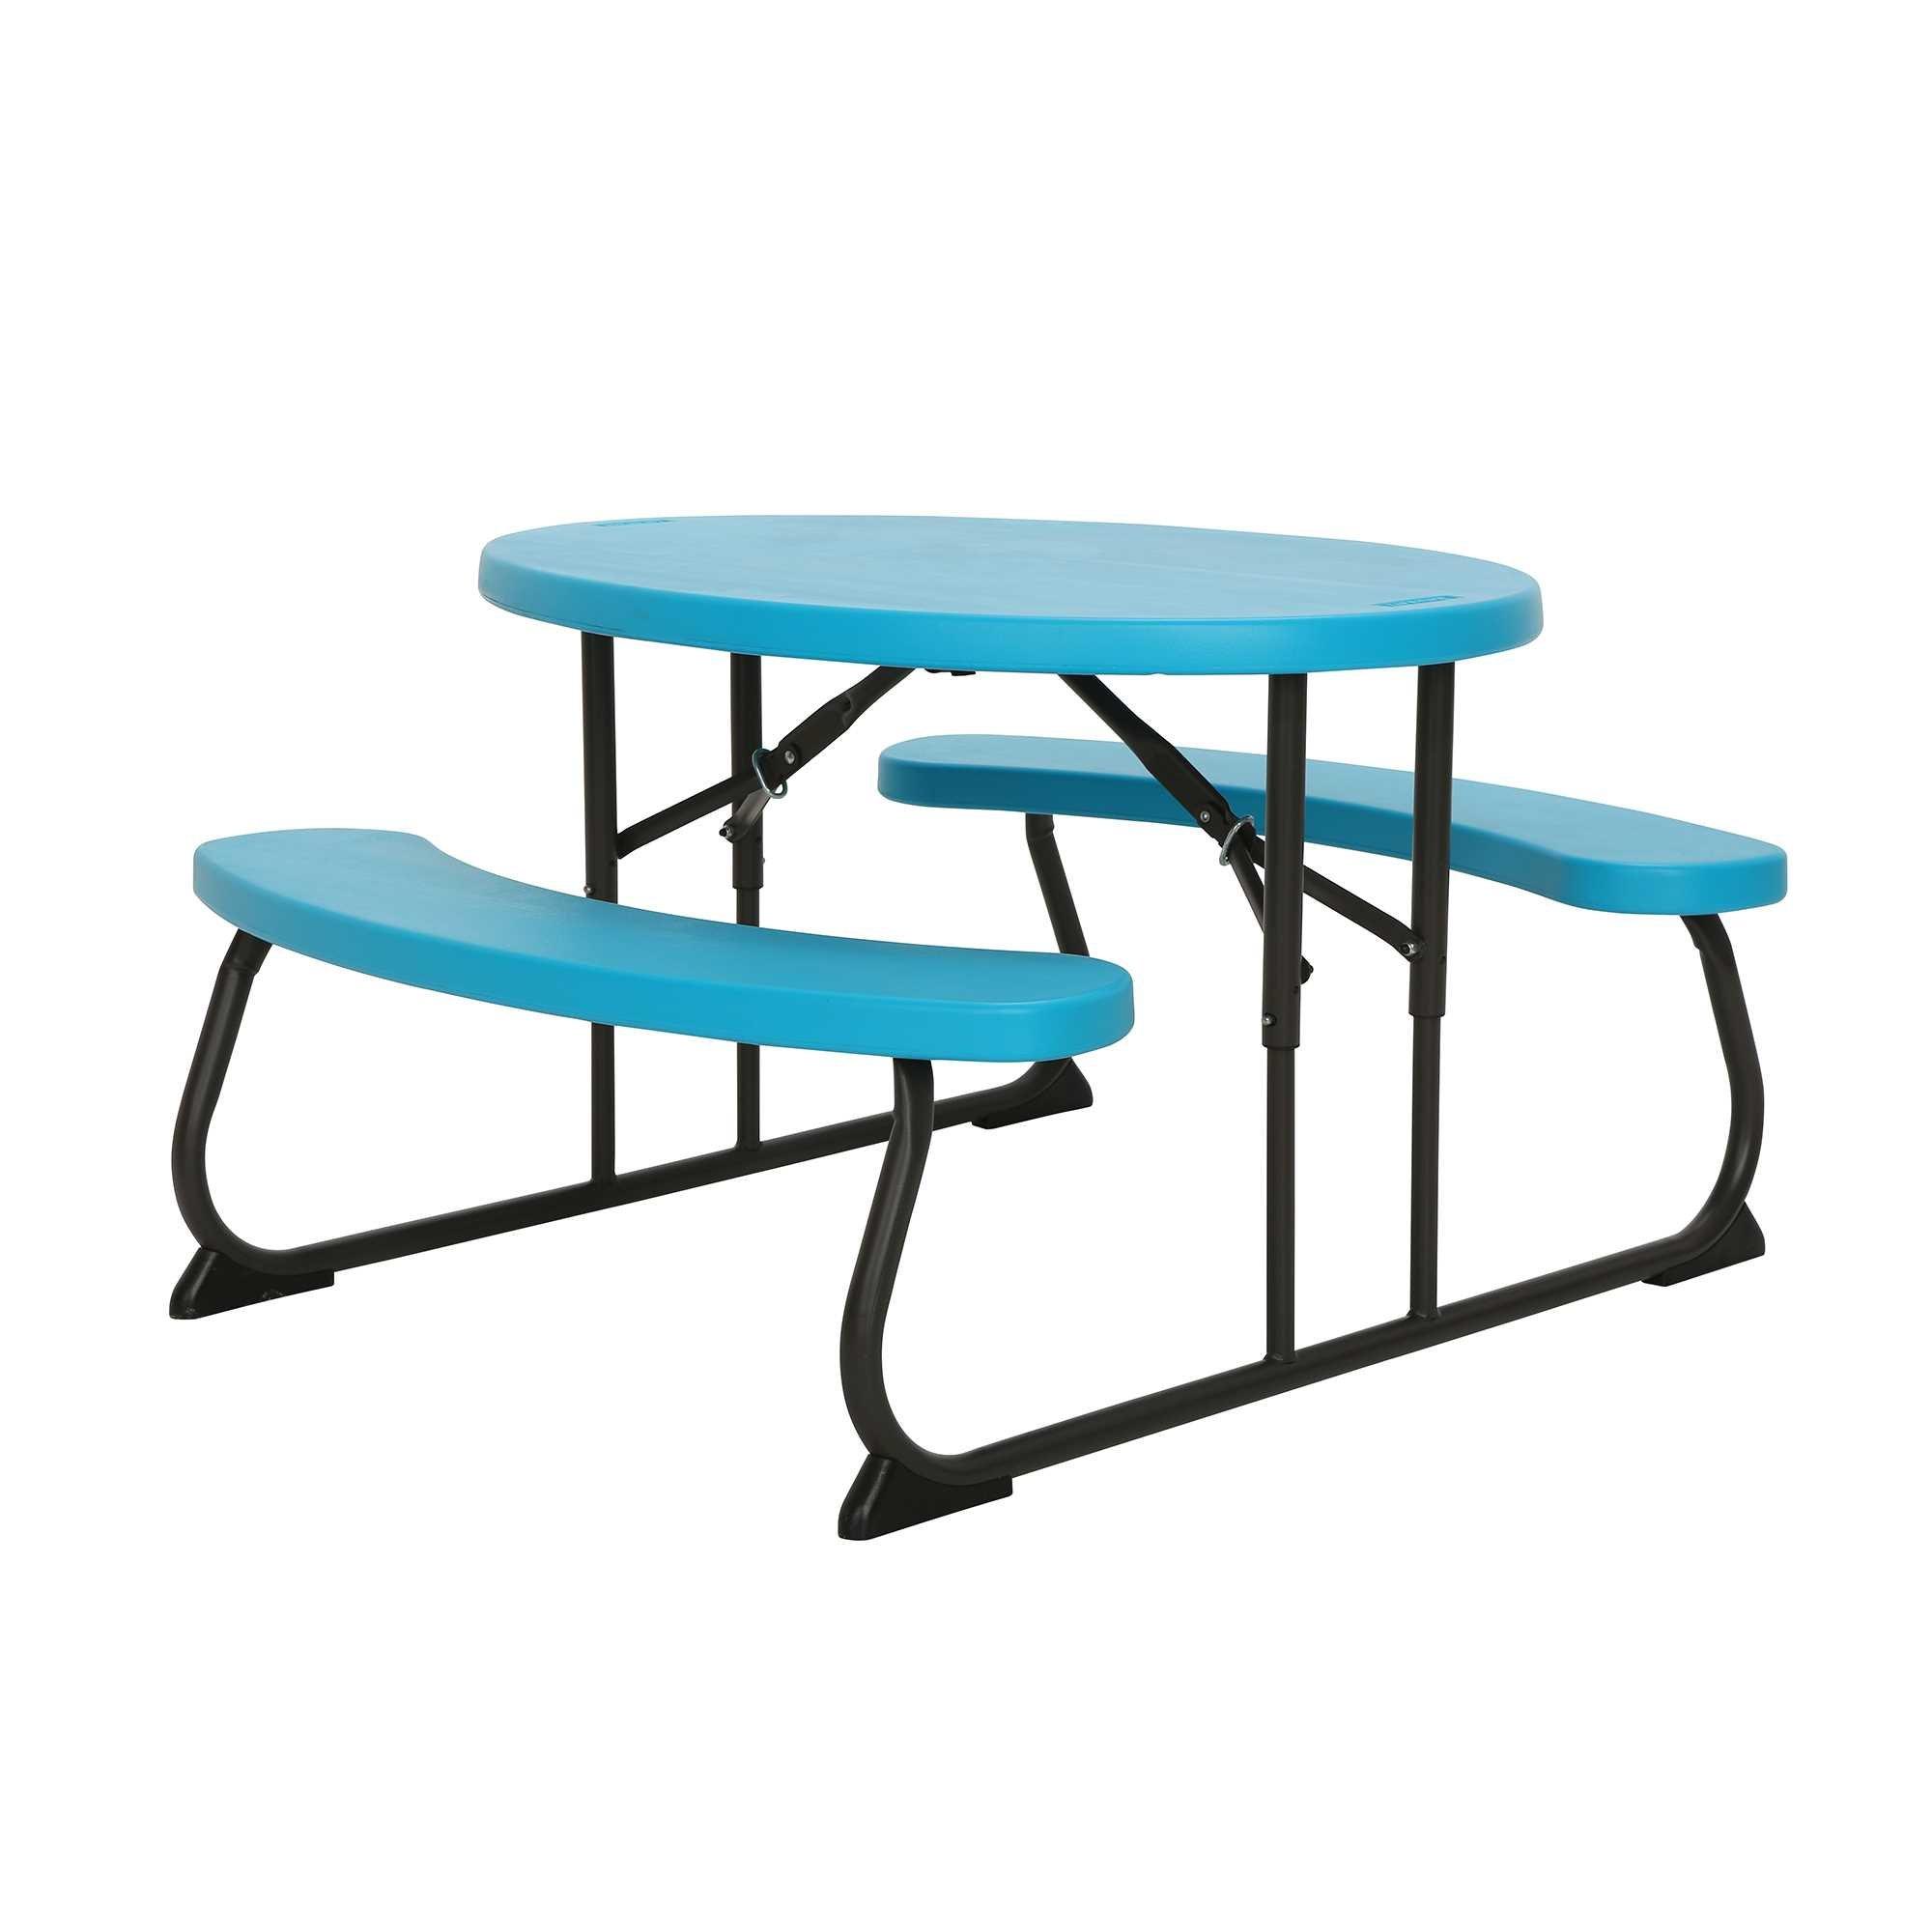 Lifetime 60229 Kids Oval Picnic Table, Glacier Blue by Lifetime